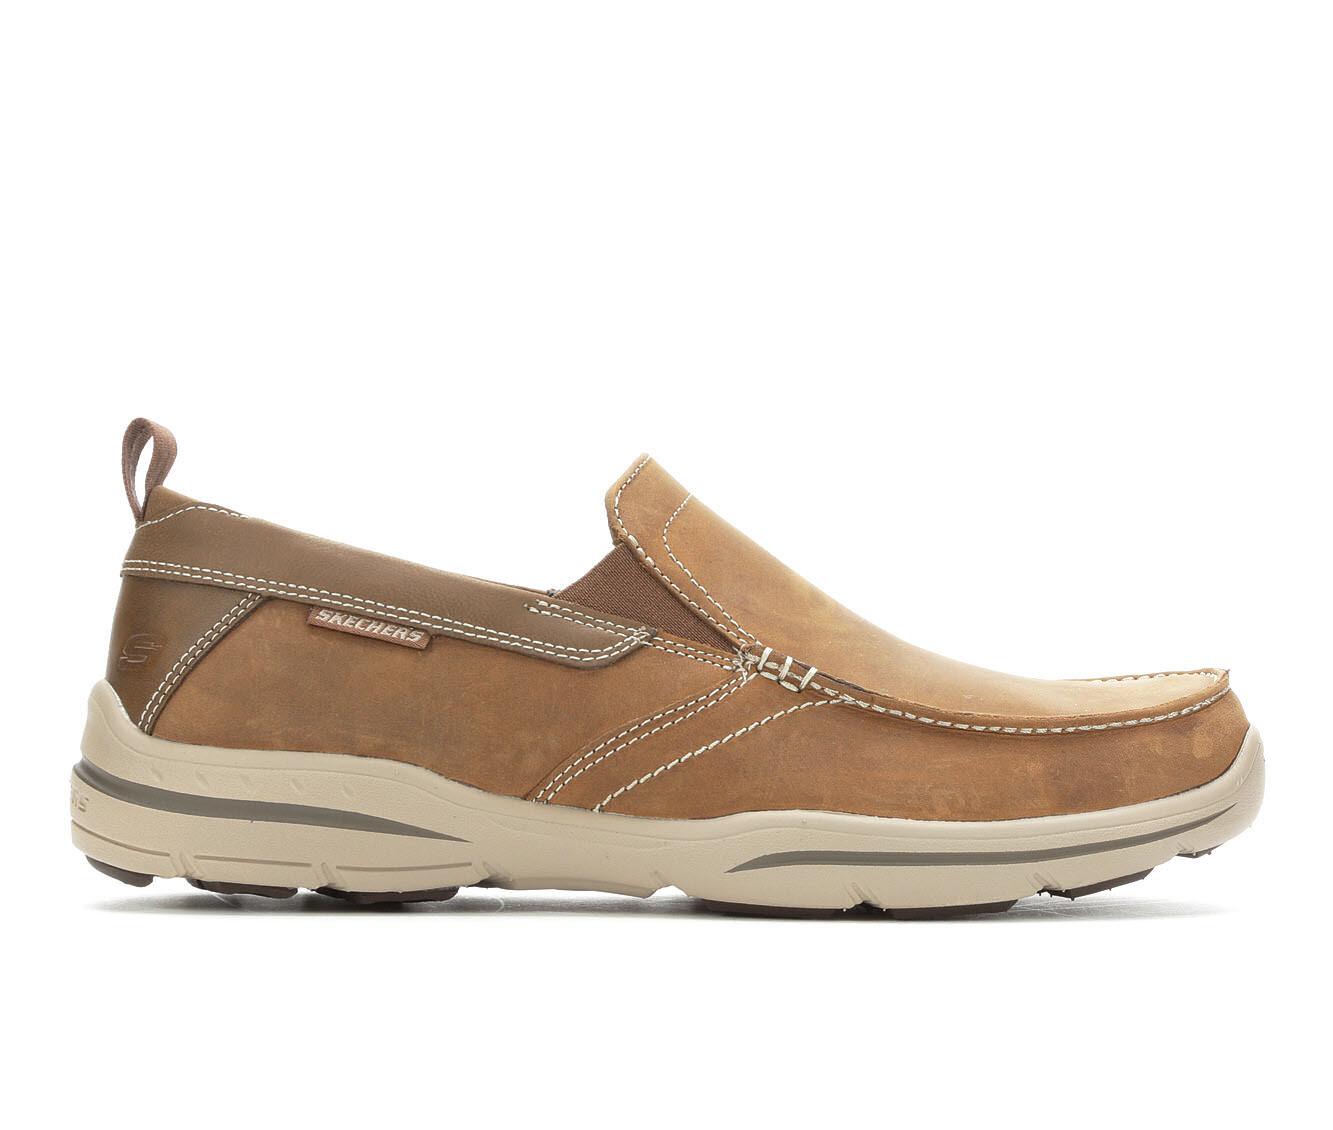 Men's Skechers Forde 64858 Casual Moc Loafers Desert Crazy